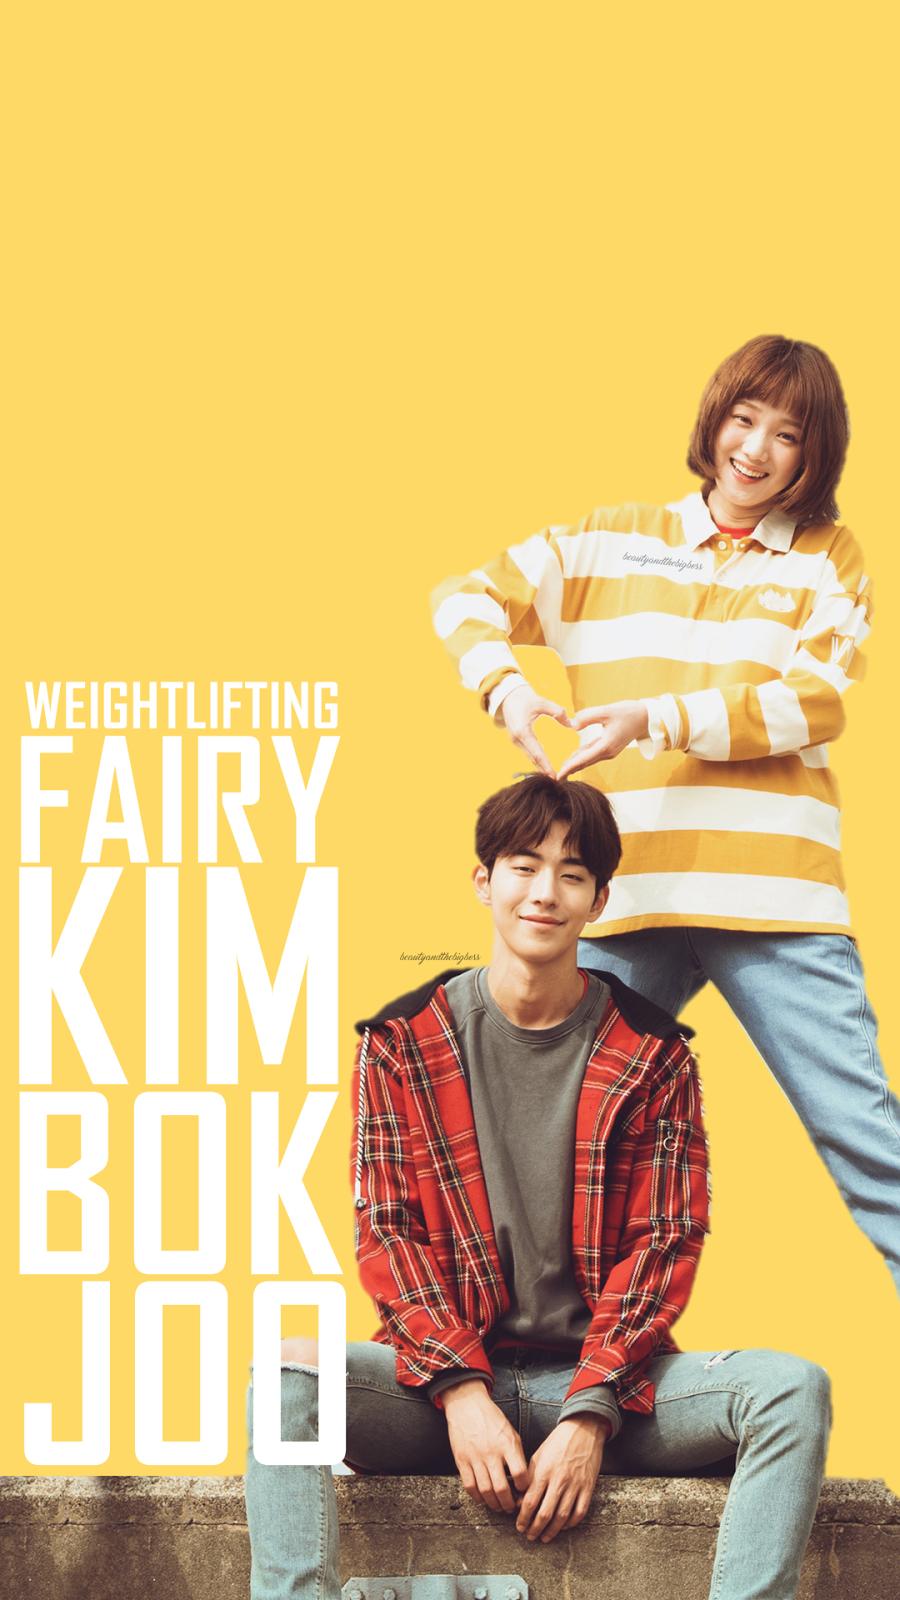 Nonton Drama Weightlifting Fairy Kim Bok Joo : nonton, drama, weightlifting, fairy, NURASTORYLINE:, Review, Drama, Korea, Weightlifting, Fairy